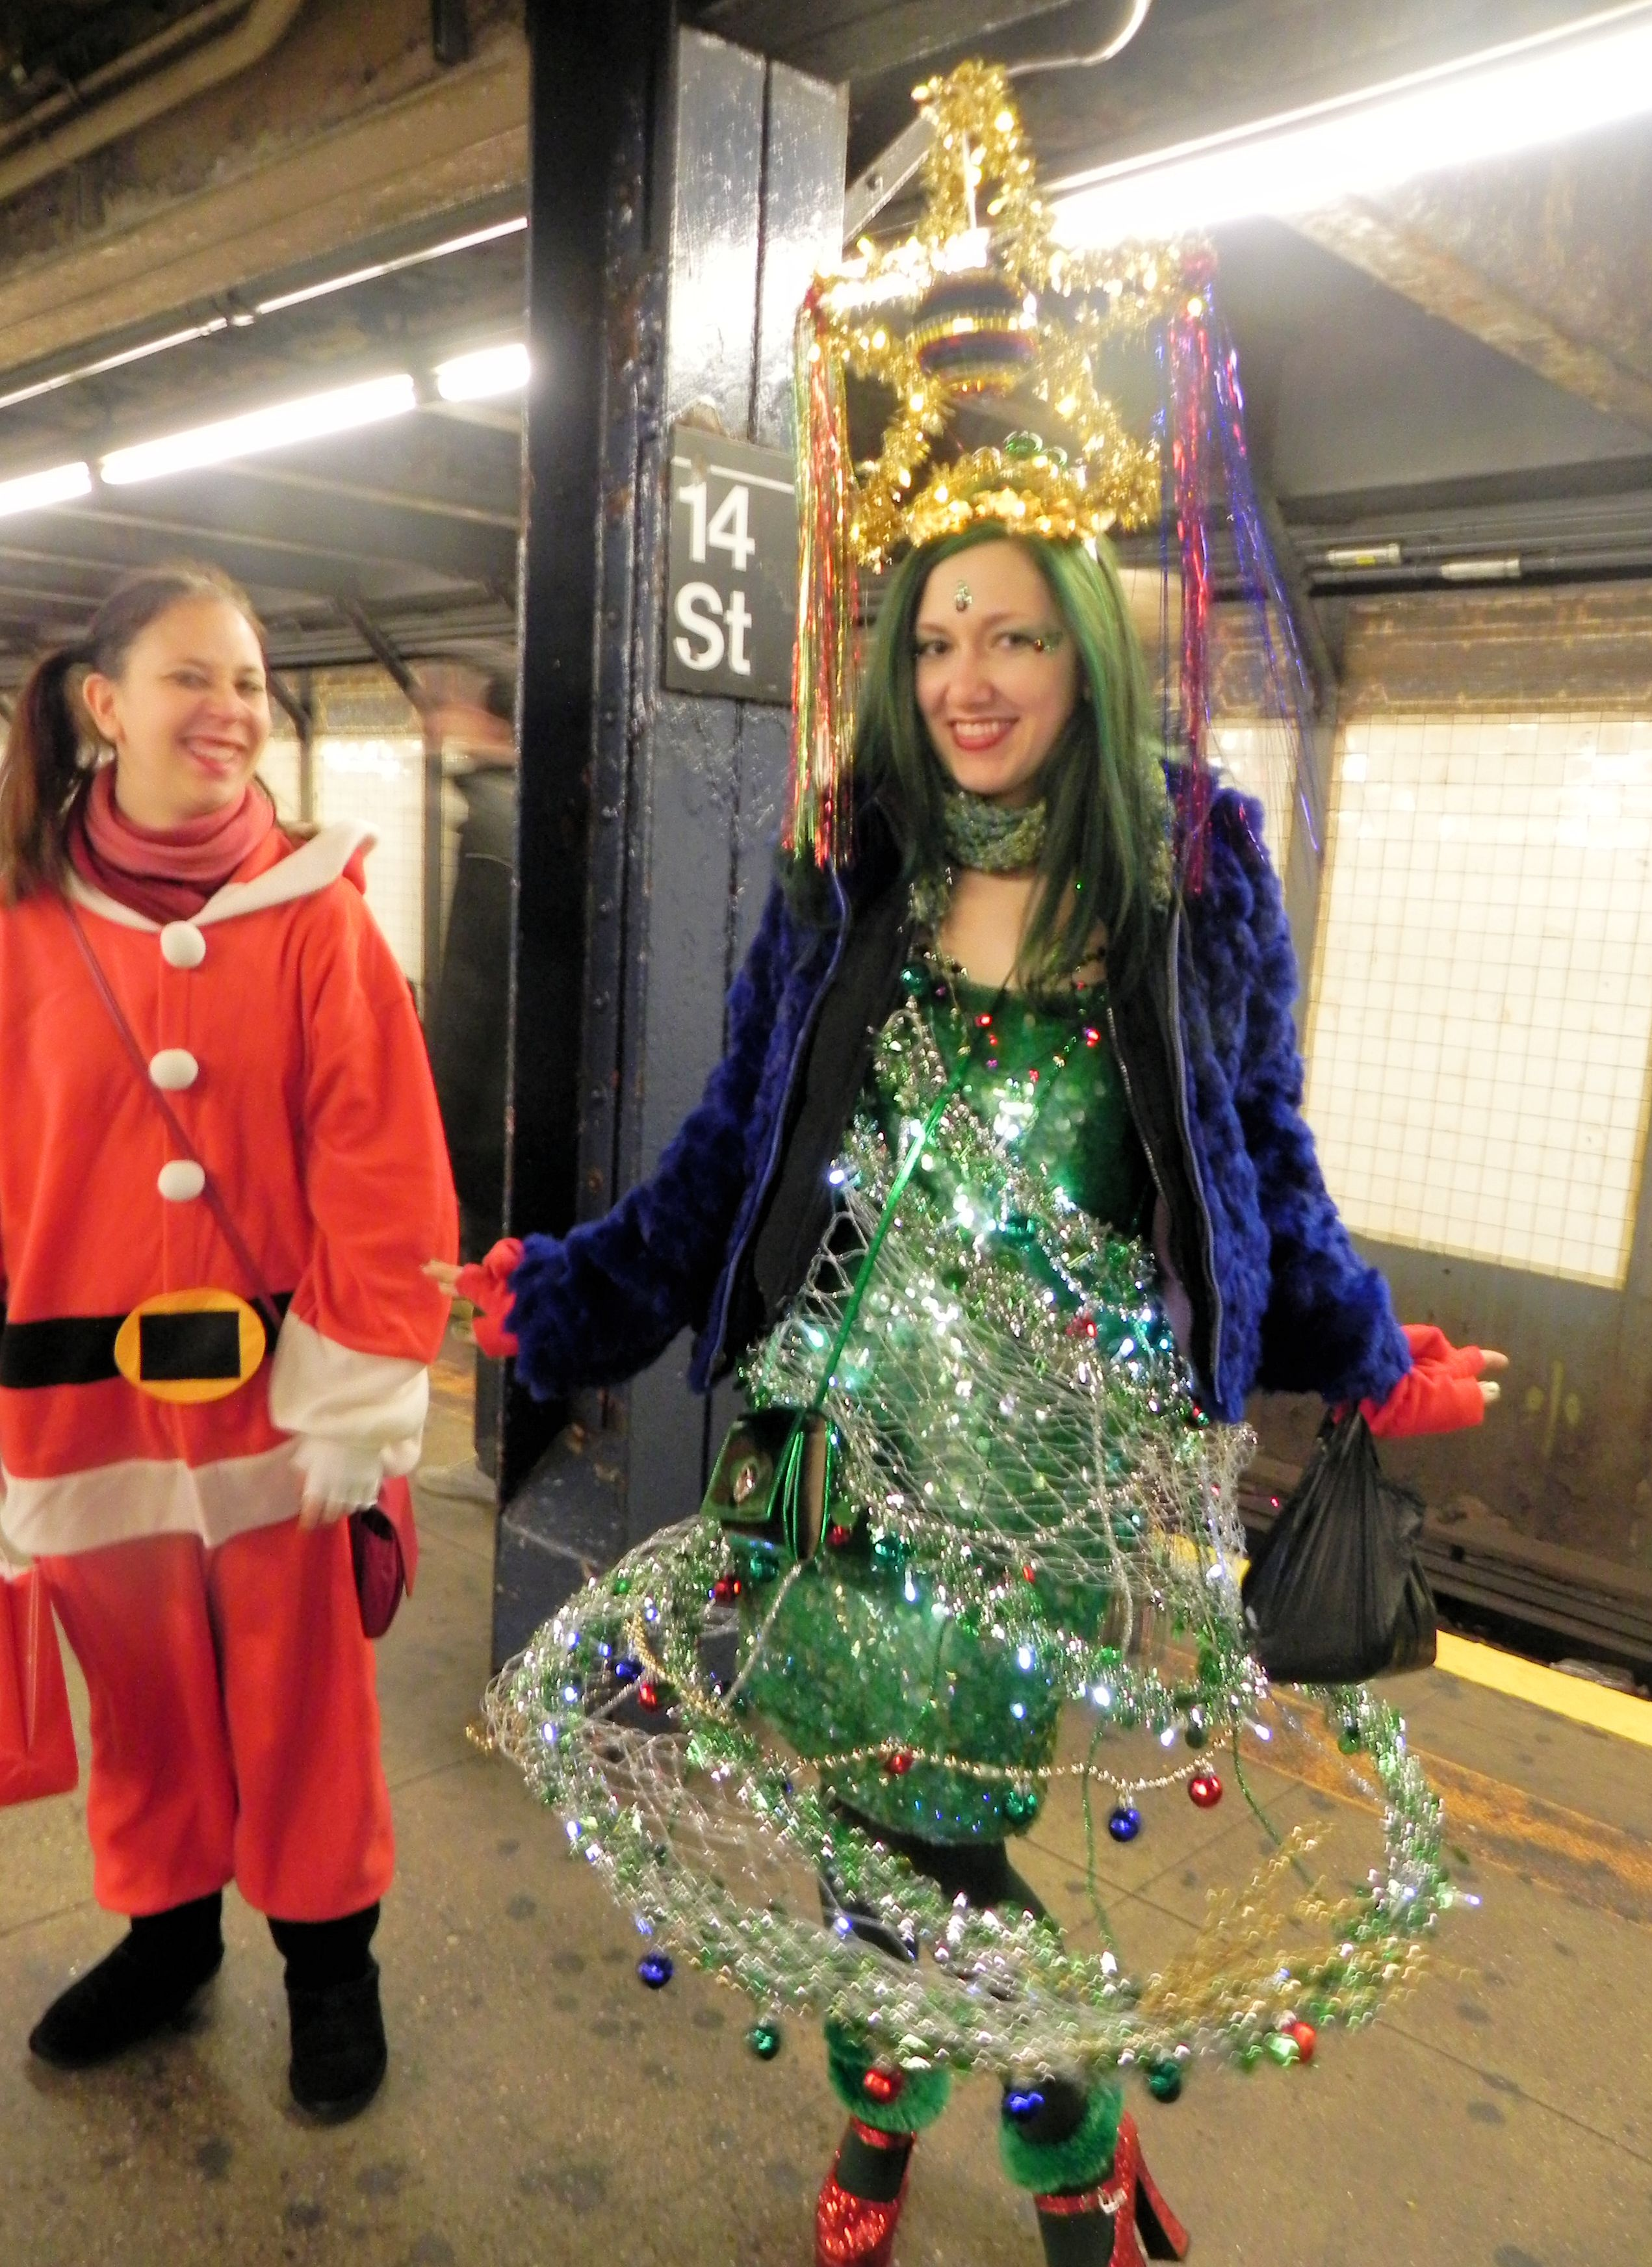 Christmas tree dress up images - Occupy North Pole Christmas Tree